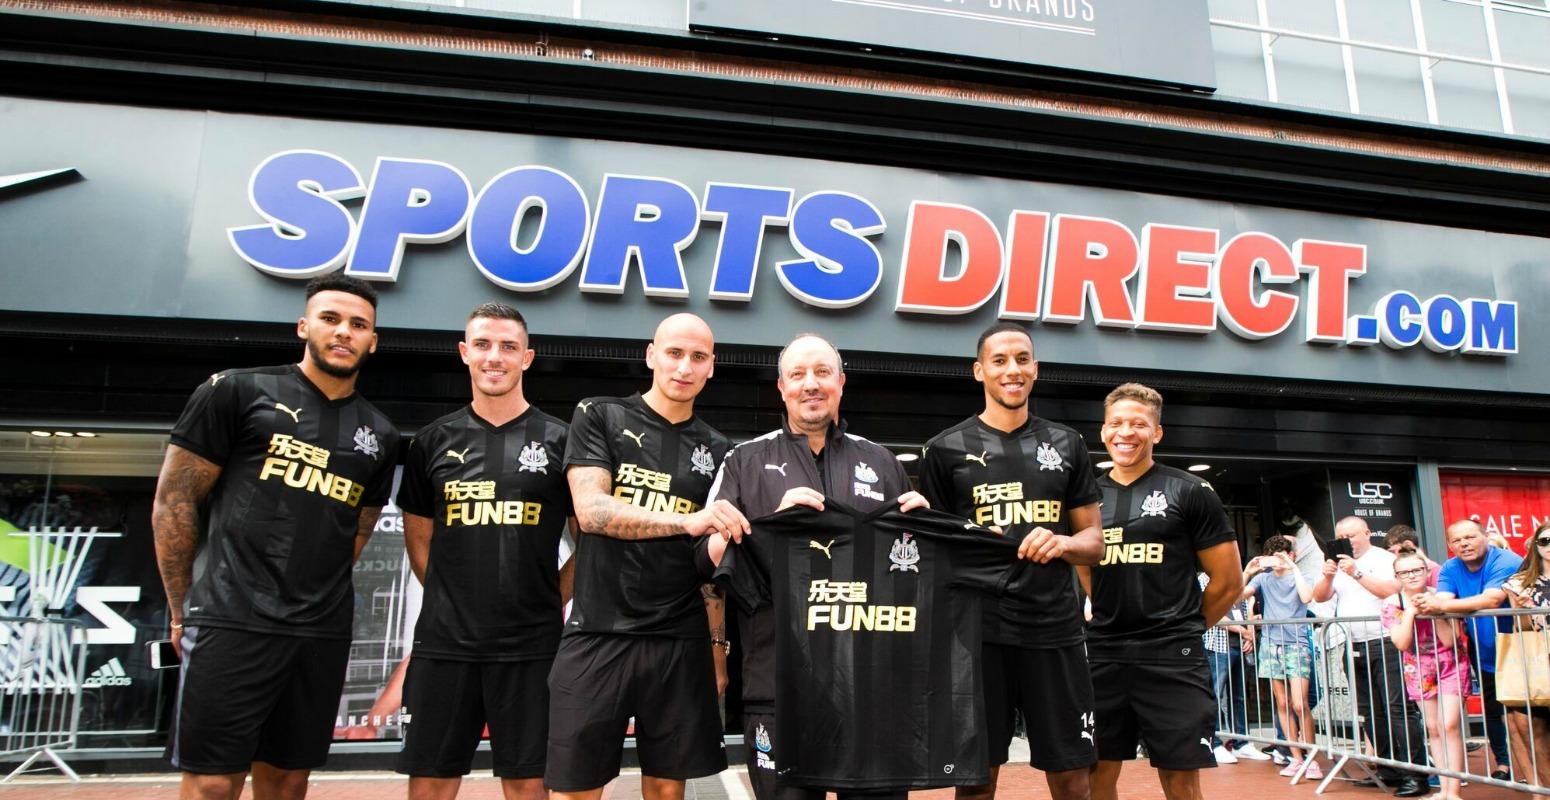 Newcastle United in Sports Direct Dublin